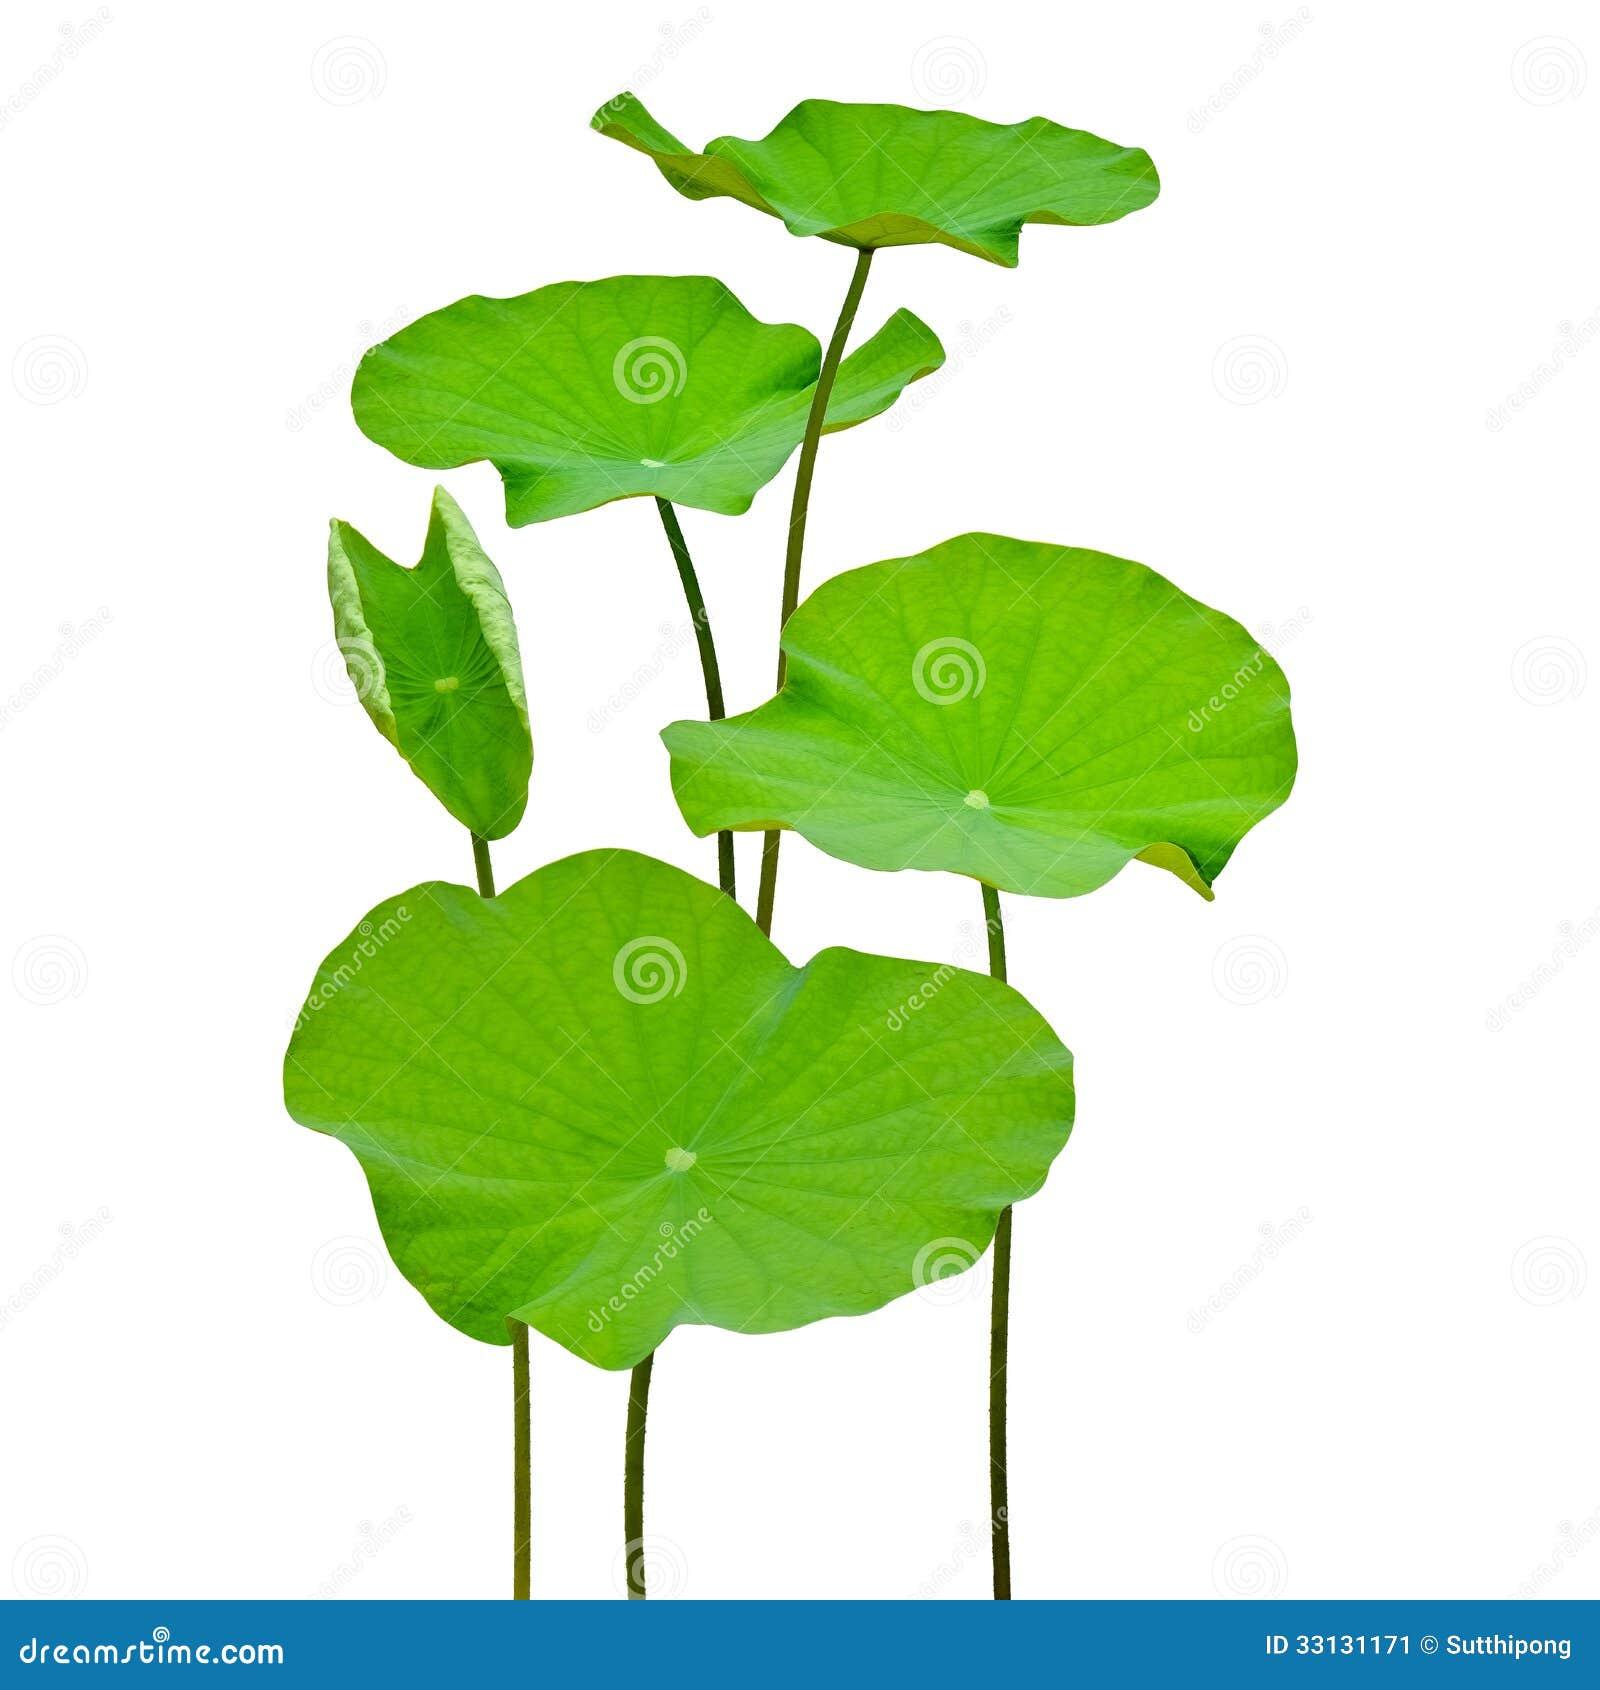 Lotus Leaf Stock Image Image Of Foliage Lotus Abstract